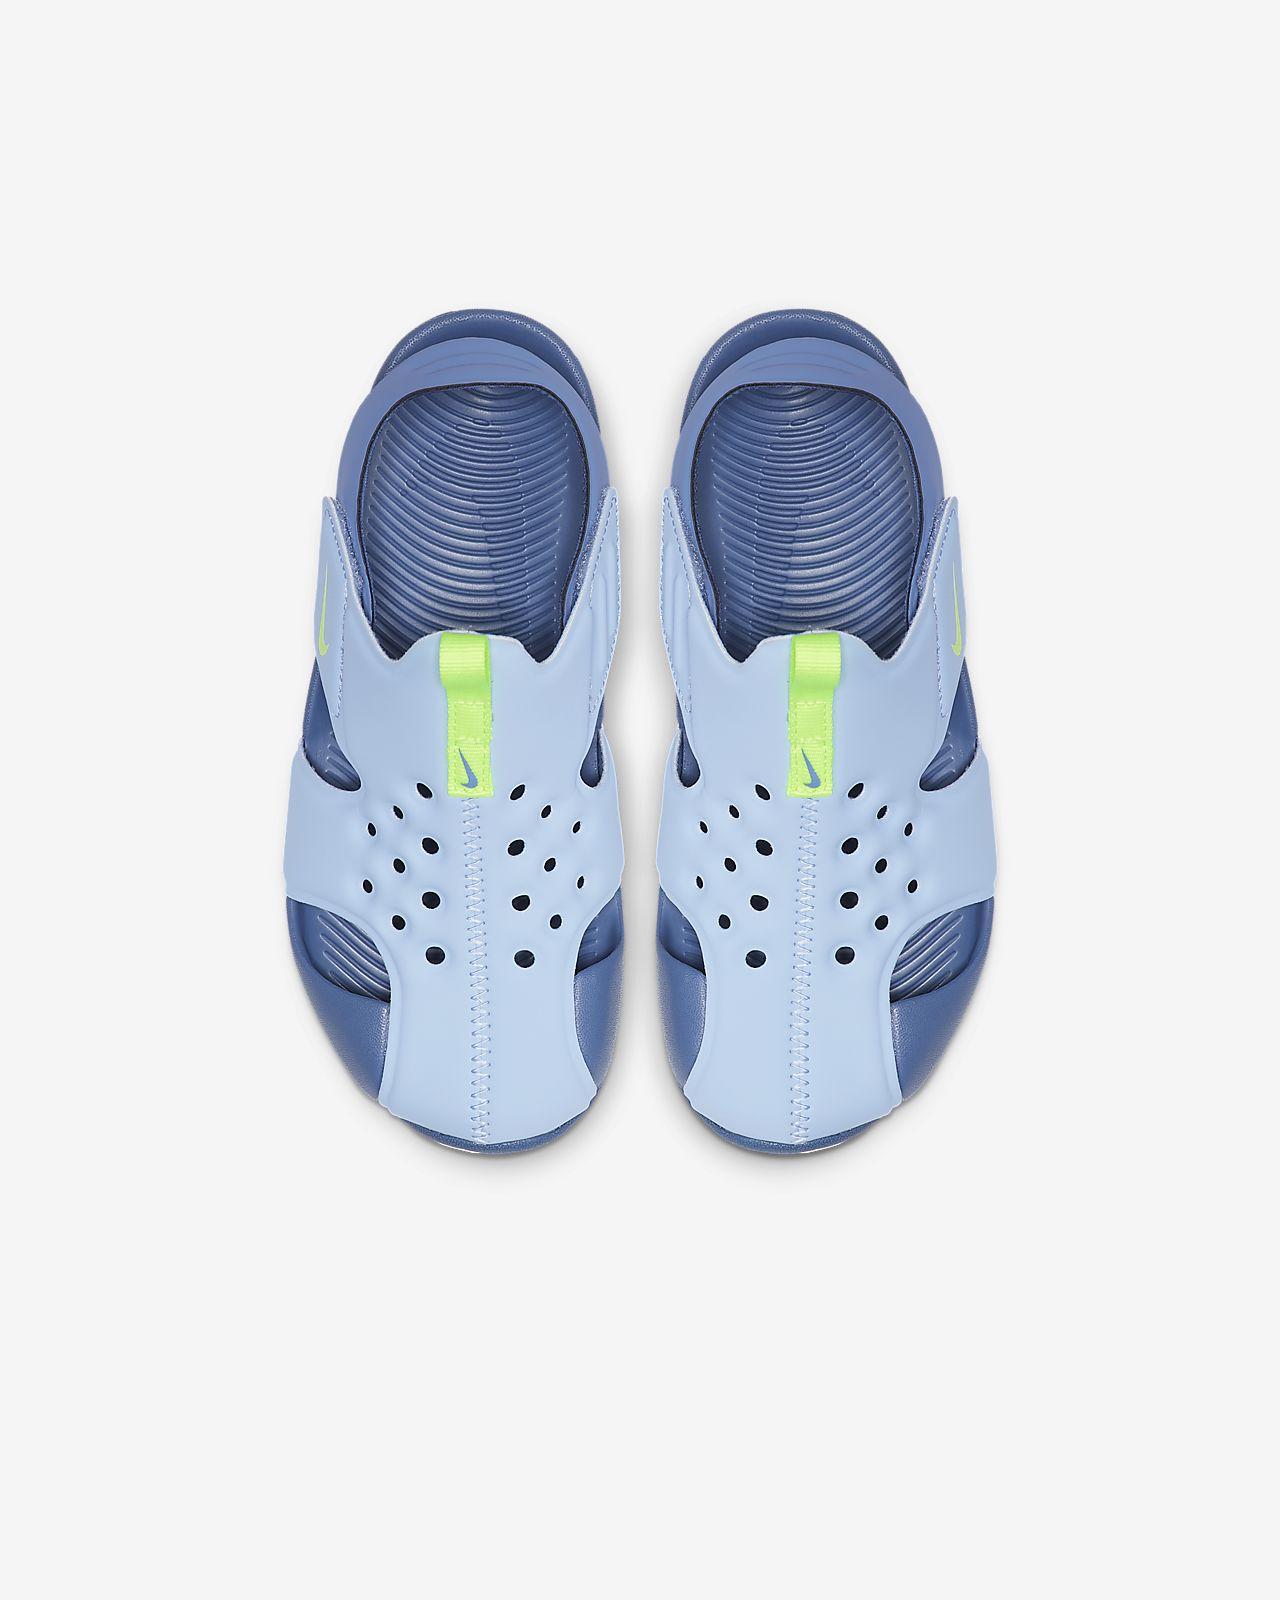 fb4afbb0e9219 Sandály Nike Sunray Protect 2 pro malé děti. Nike.com CZ